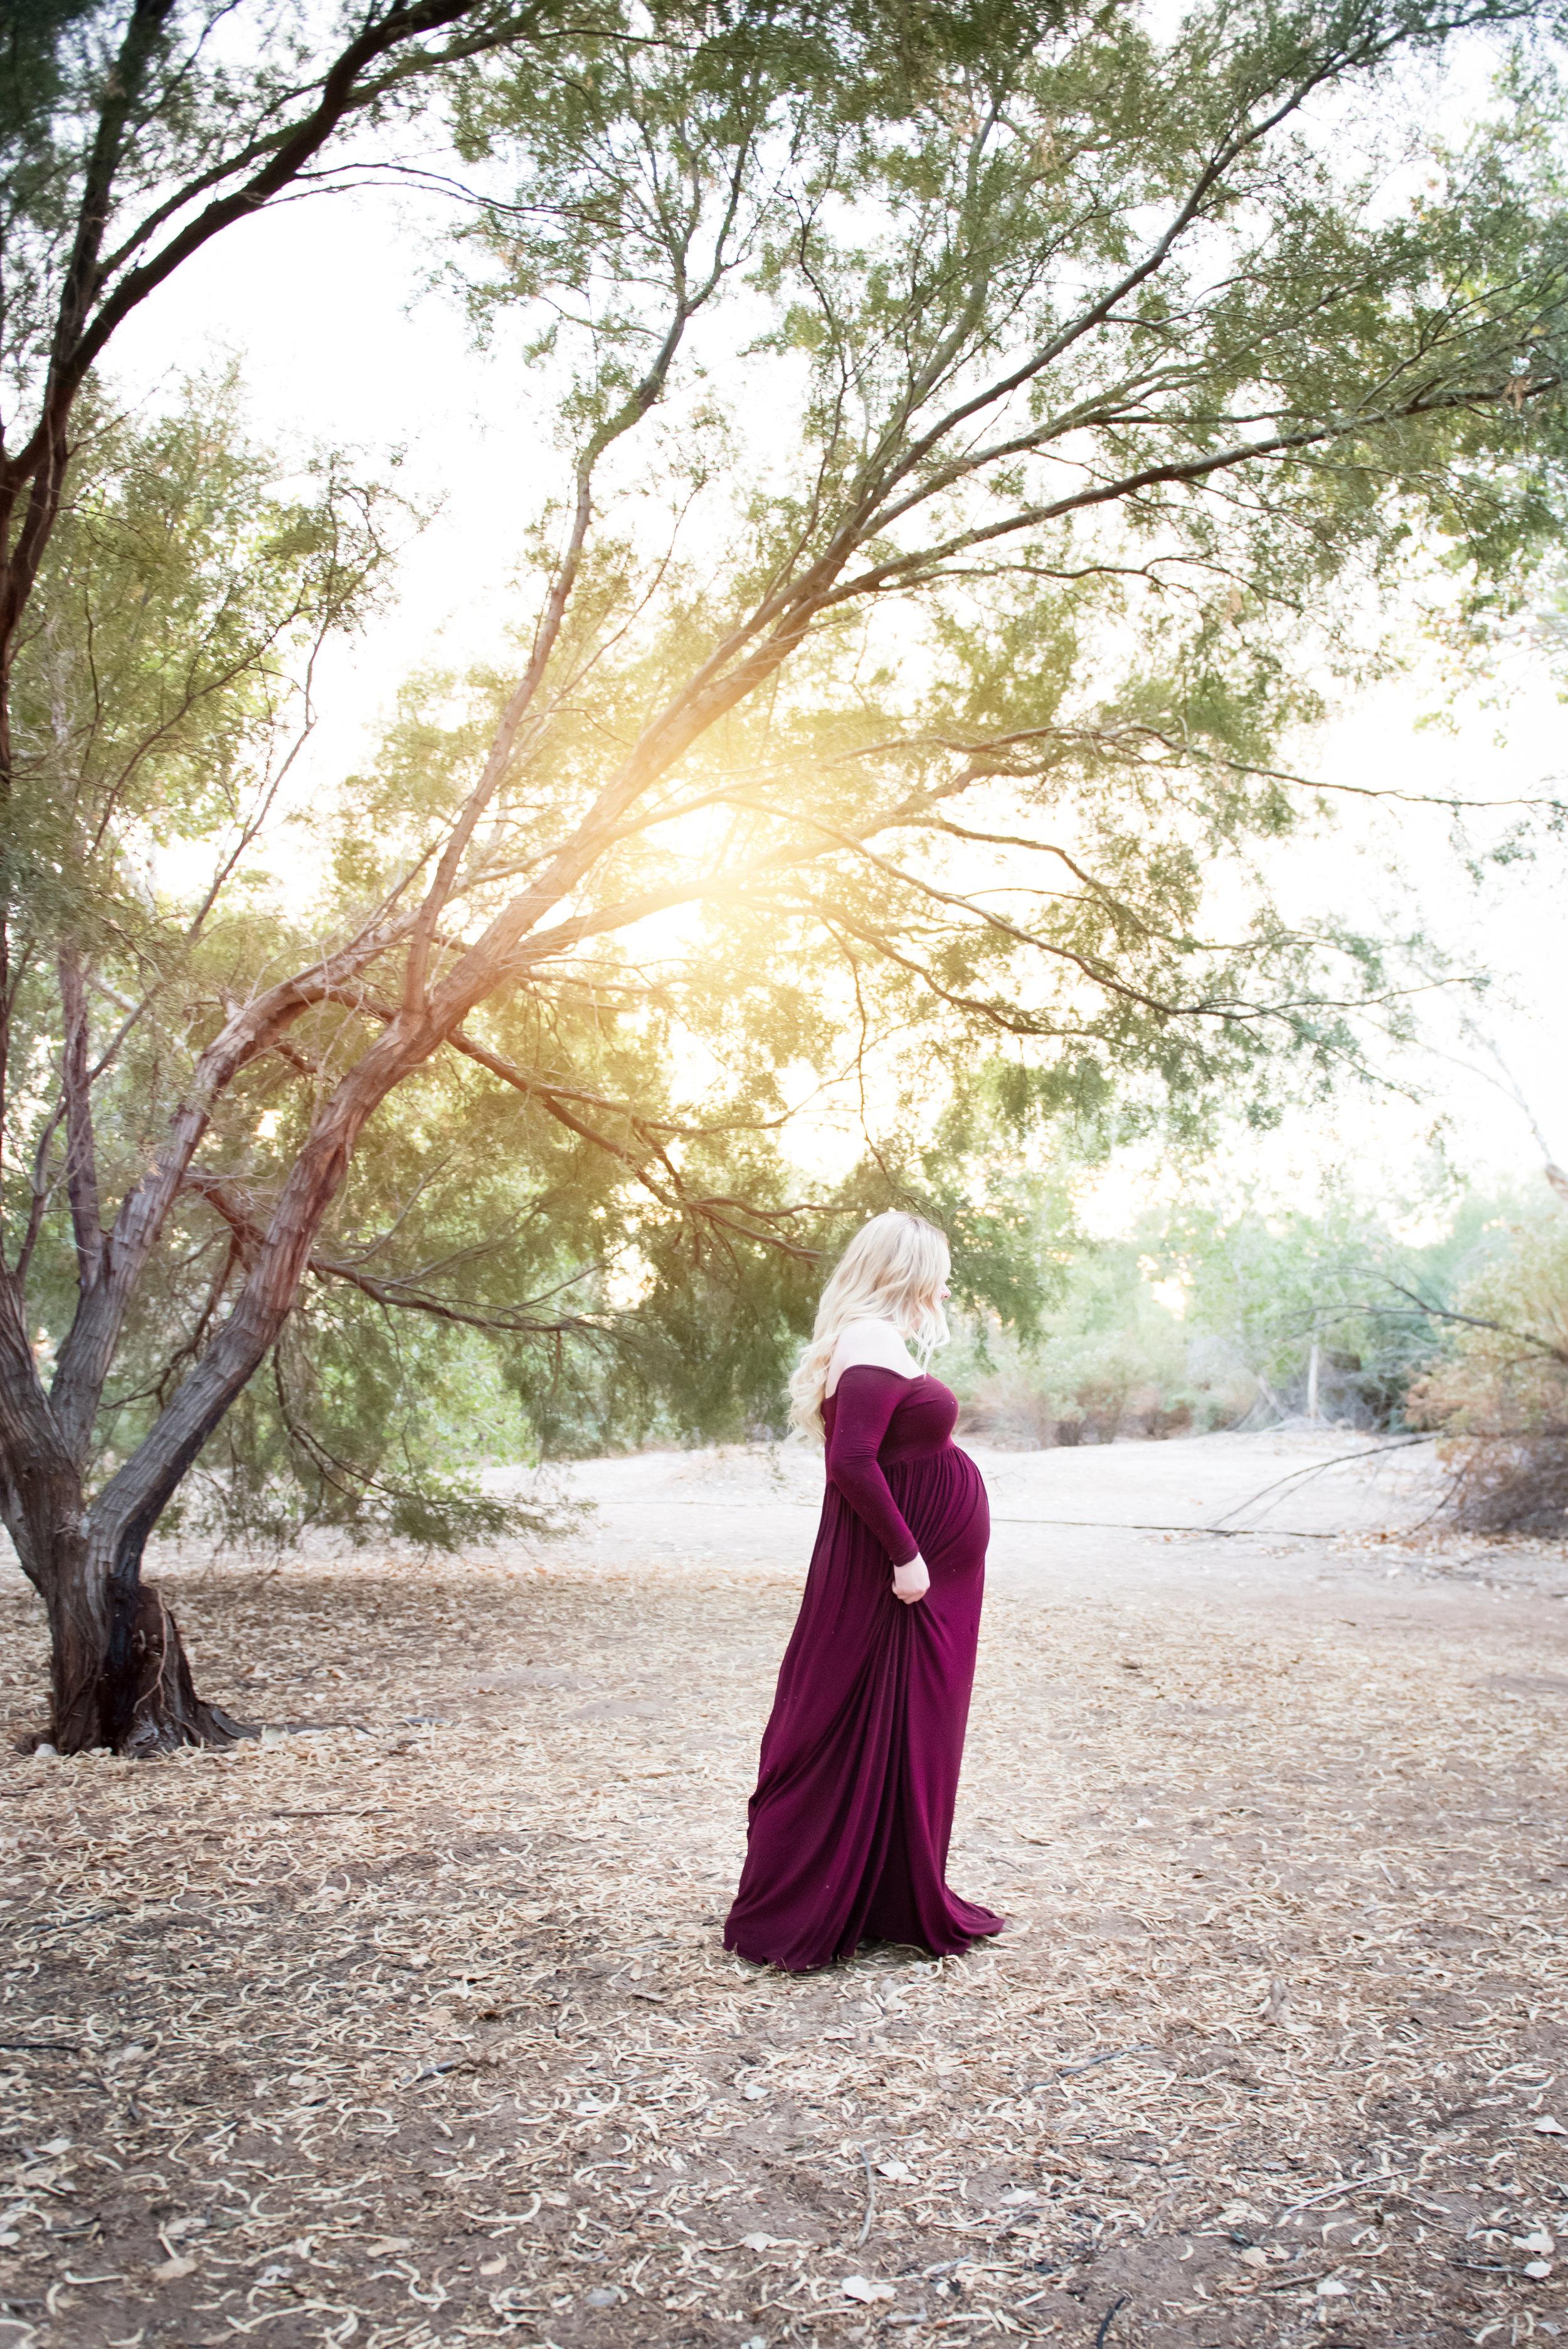 Forest Maternity Photos - Maroon Maternity Photo Dress - Reflecting Grace Photography